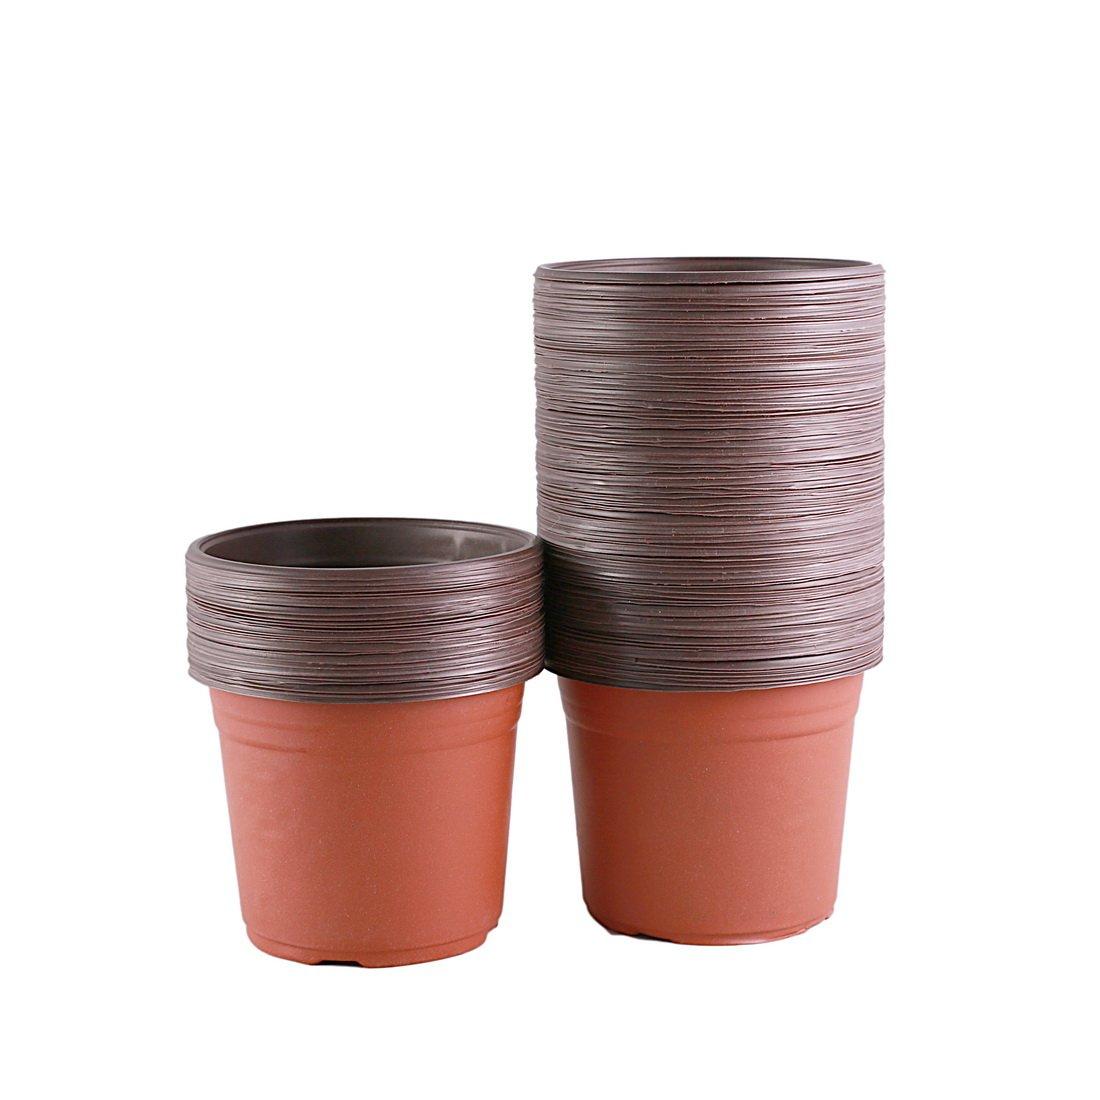 YIKUSH 6 Inch 100 Pack Plastic Nursery Pots for Seeding Flower Planter (6 Inch 100pack)